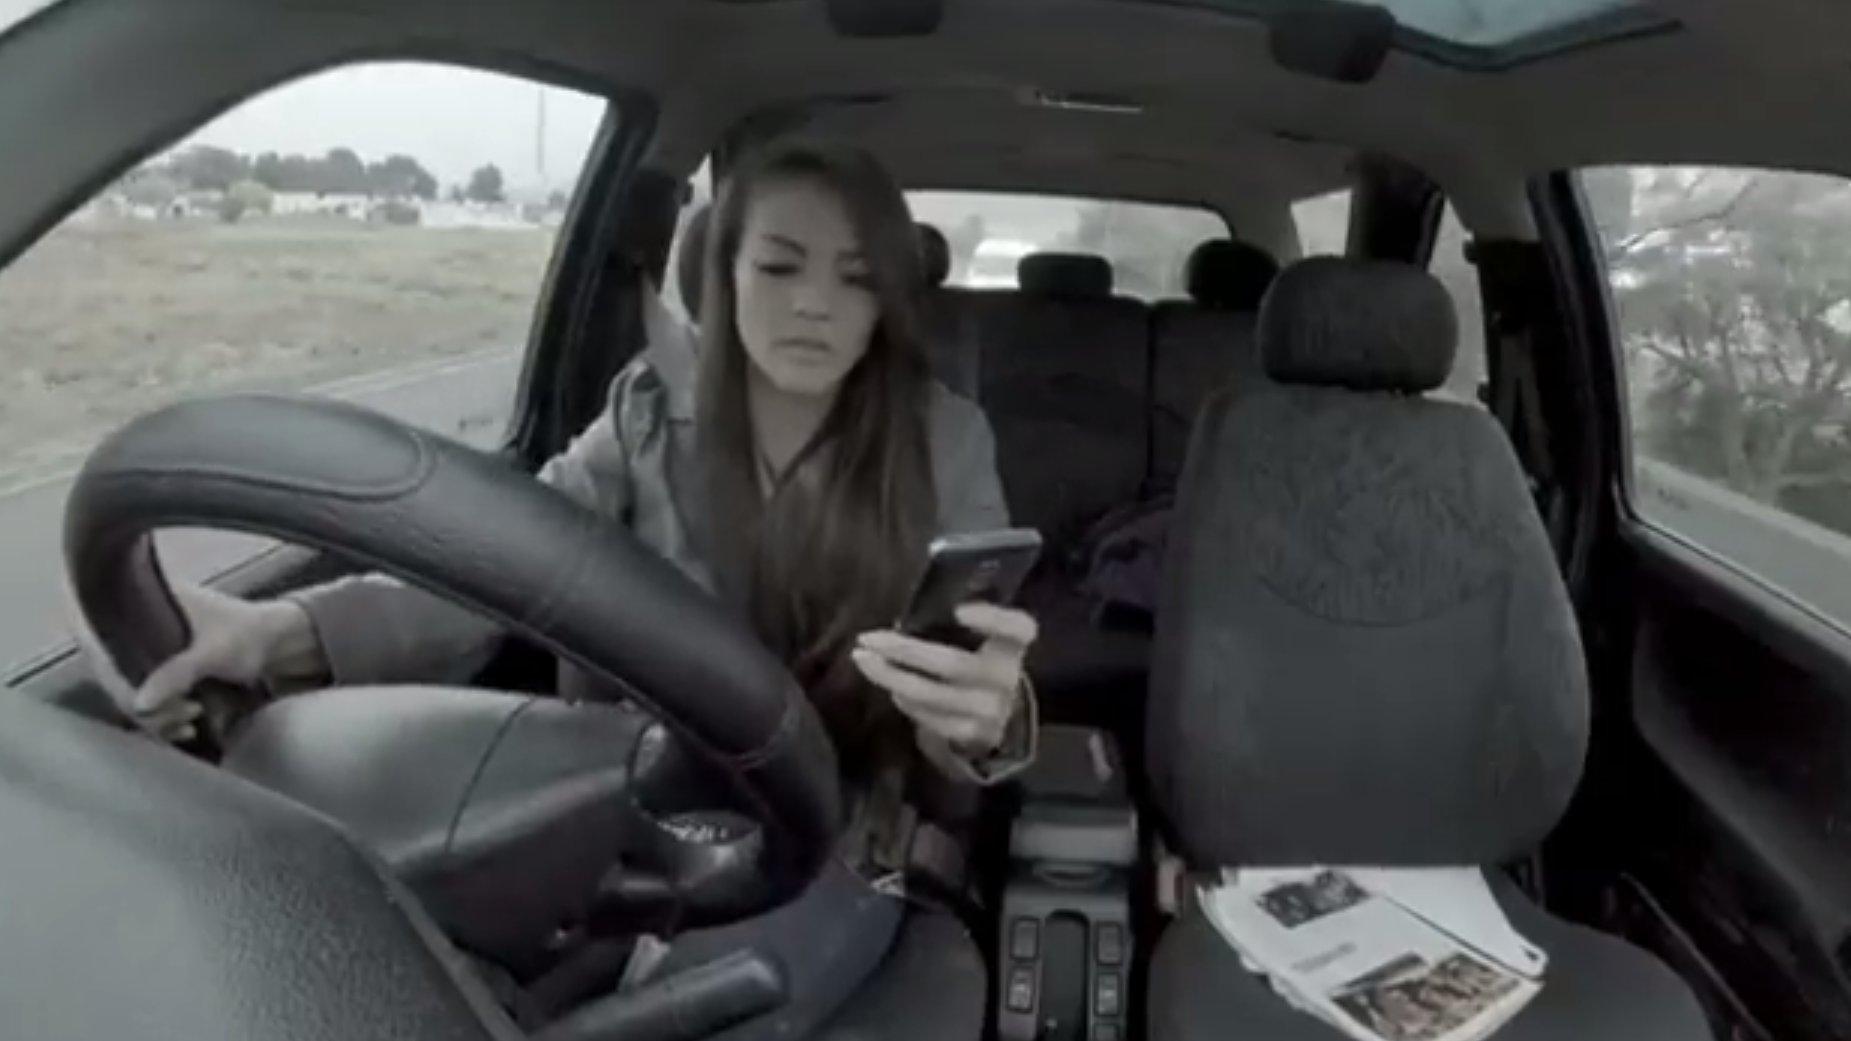 Heftiger TV-Spot aus Südafrika: Mit dem Smartphone am Lenkrad